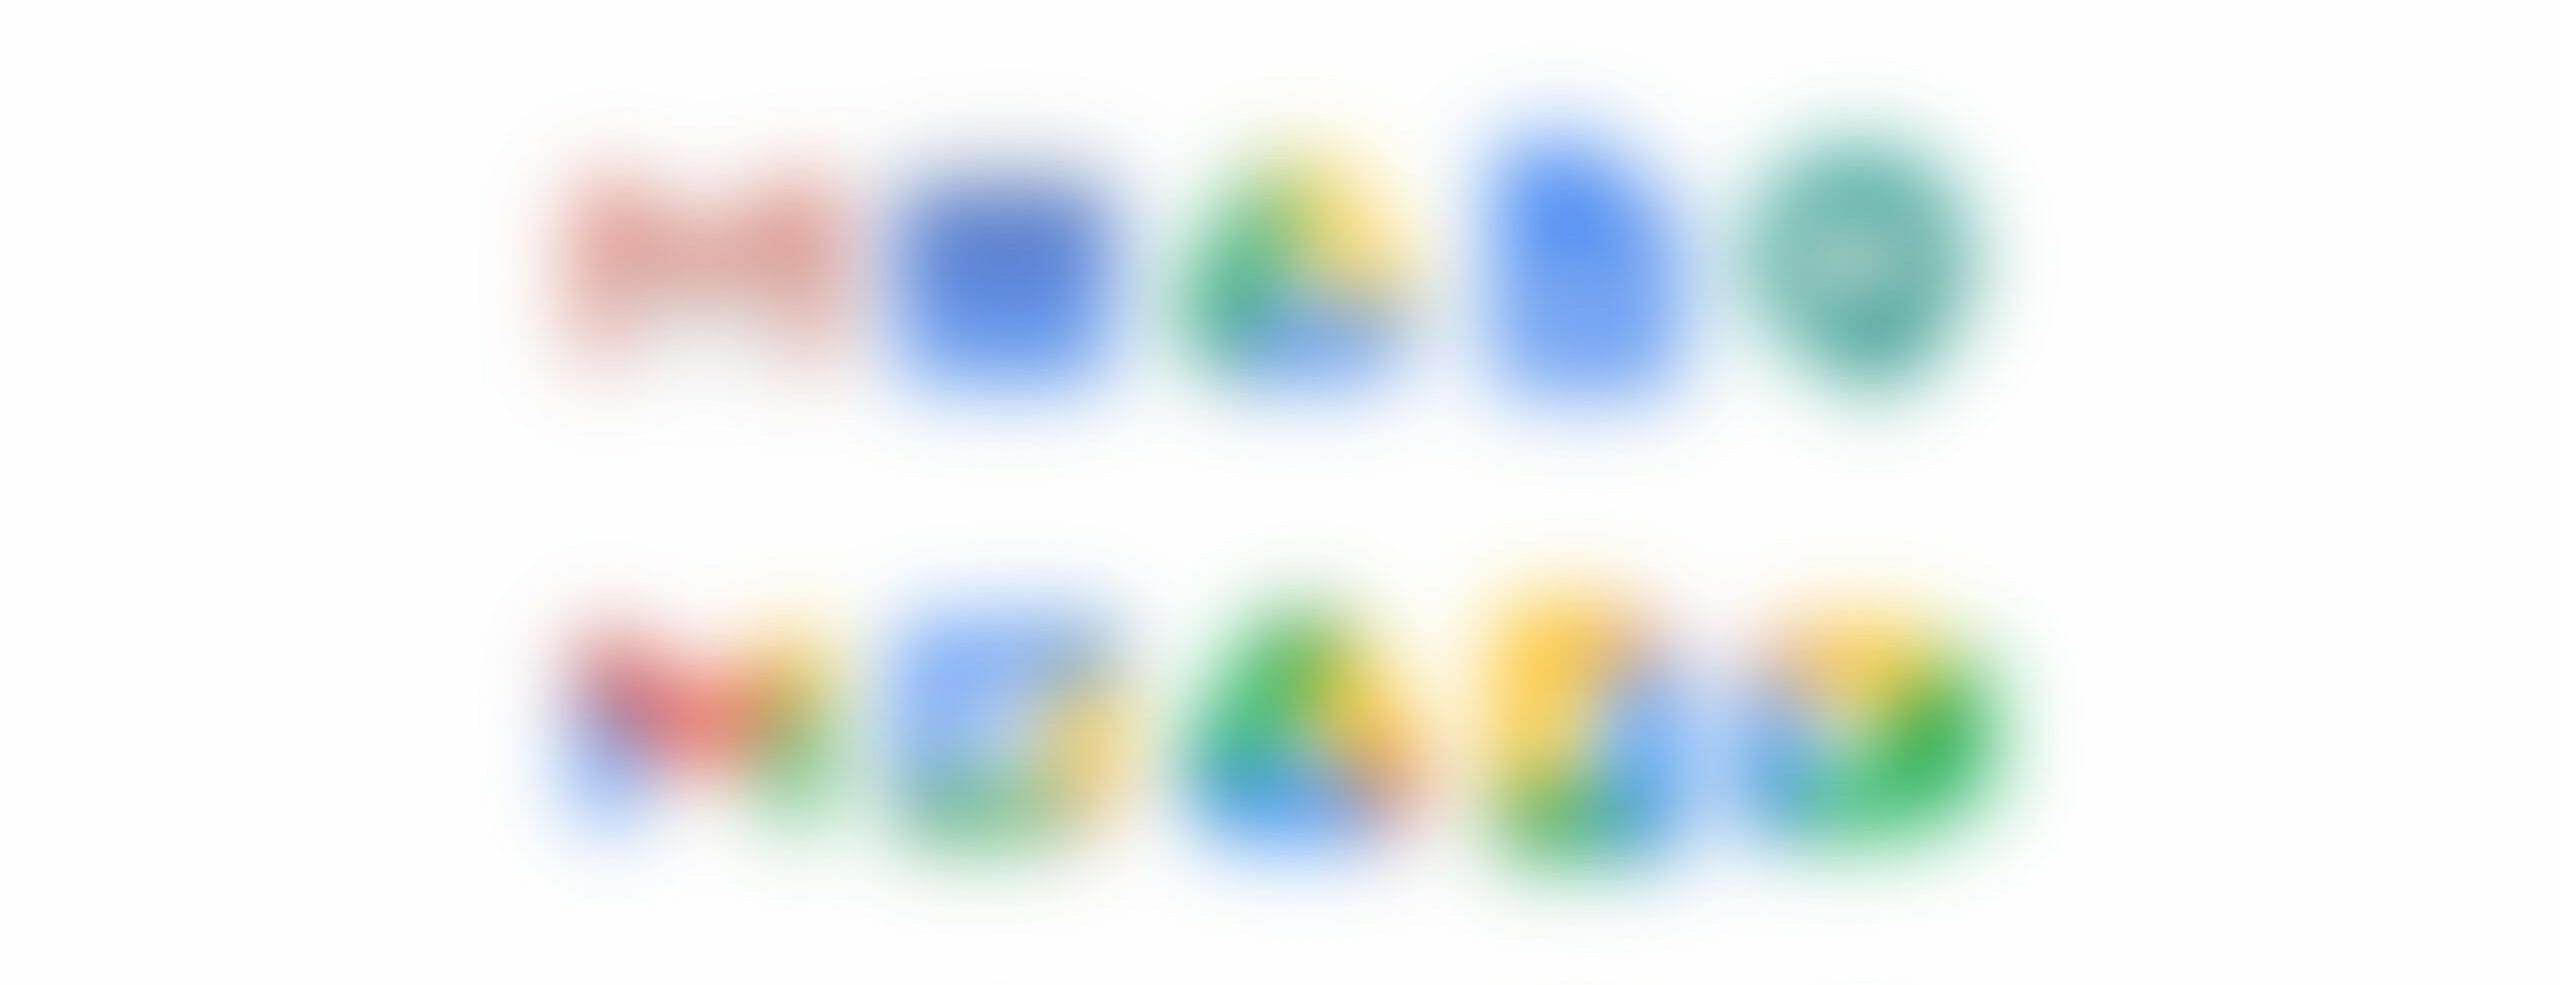 Blur Test 1